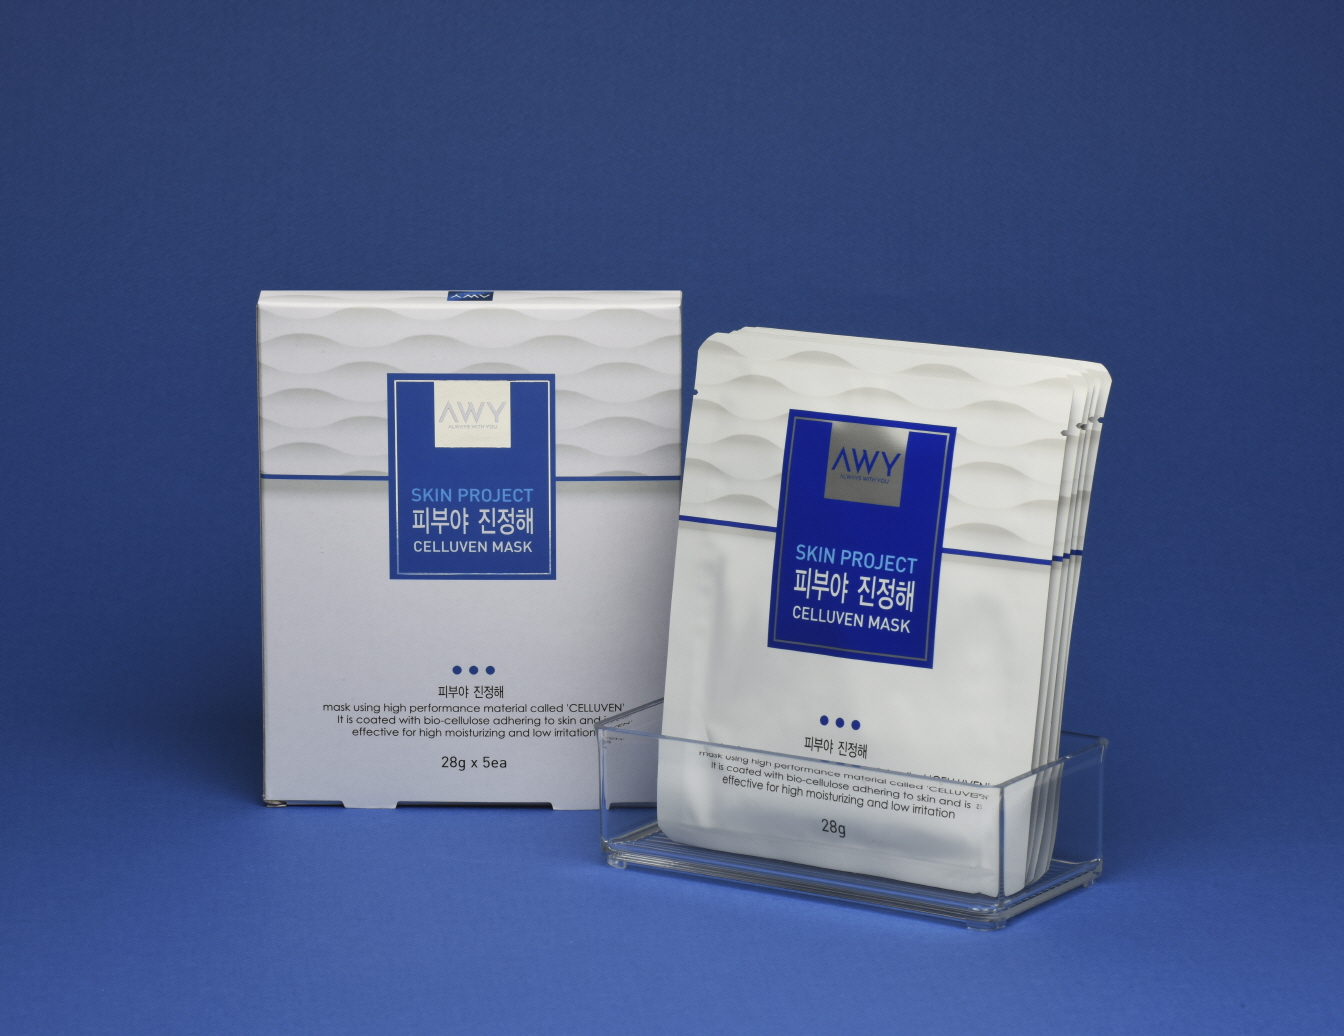 AWY Sheet mask 5 pack